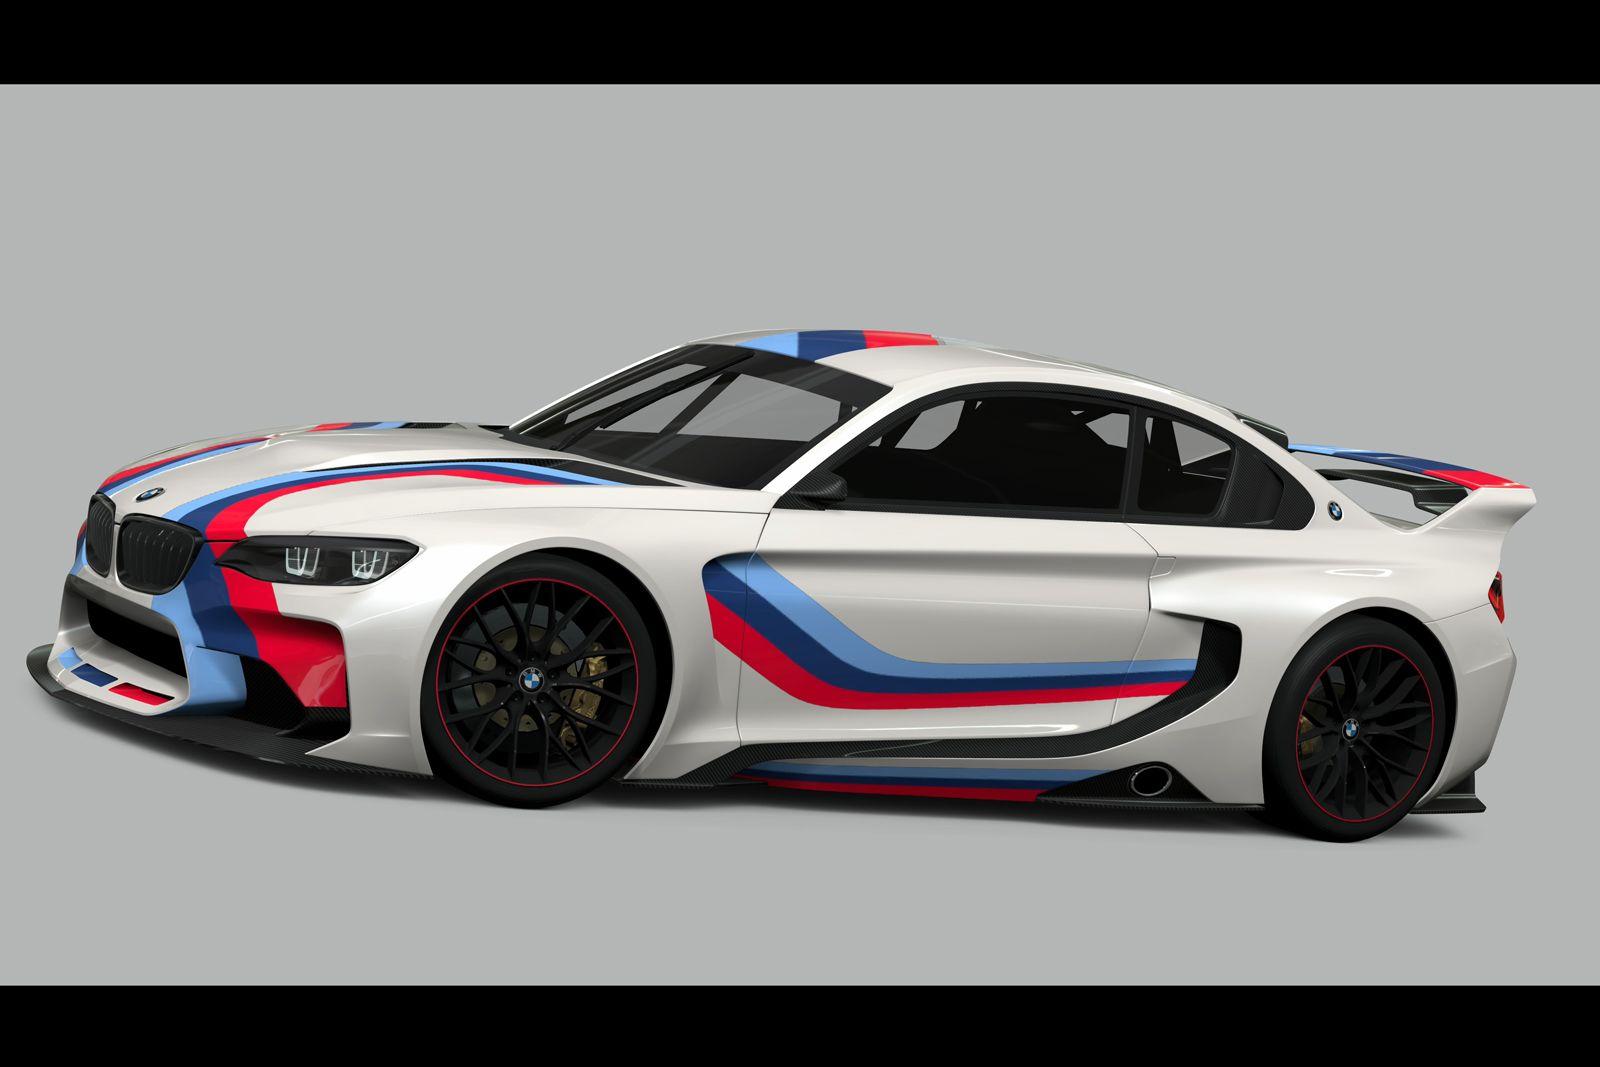 bmw m2 race car - Google Search | M2 | Pinterest | BMW and Cars